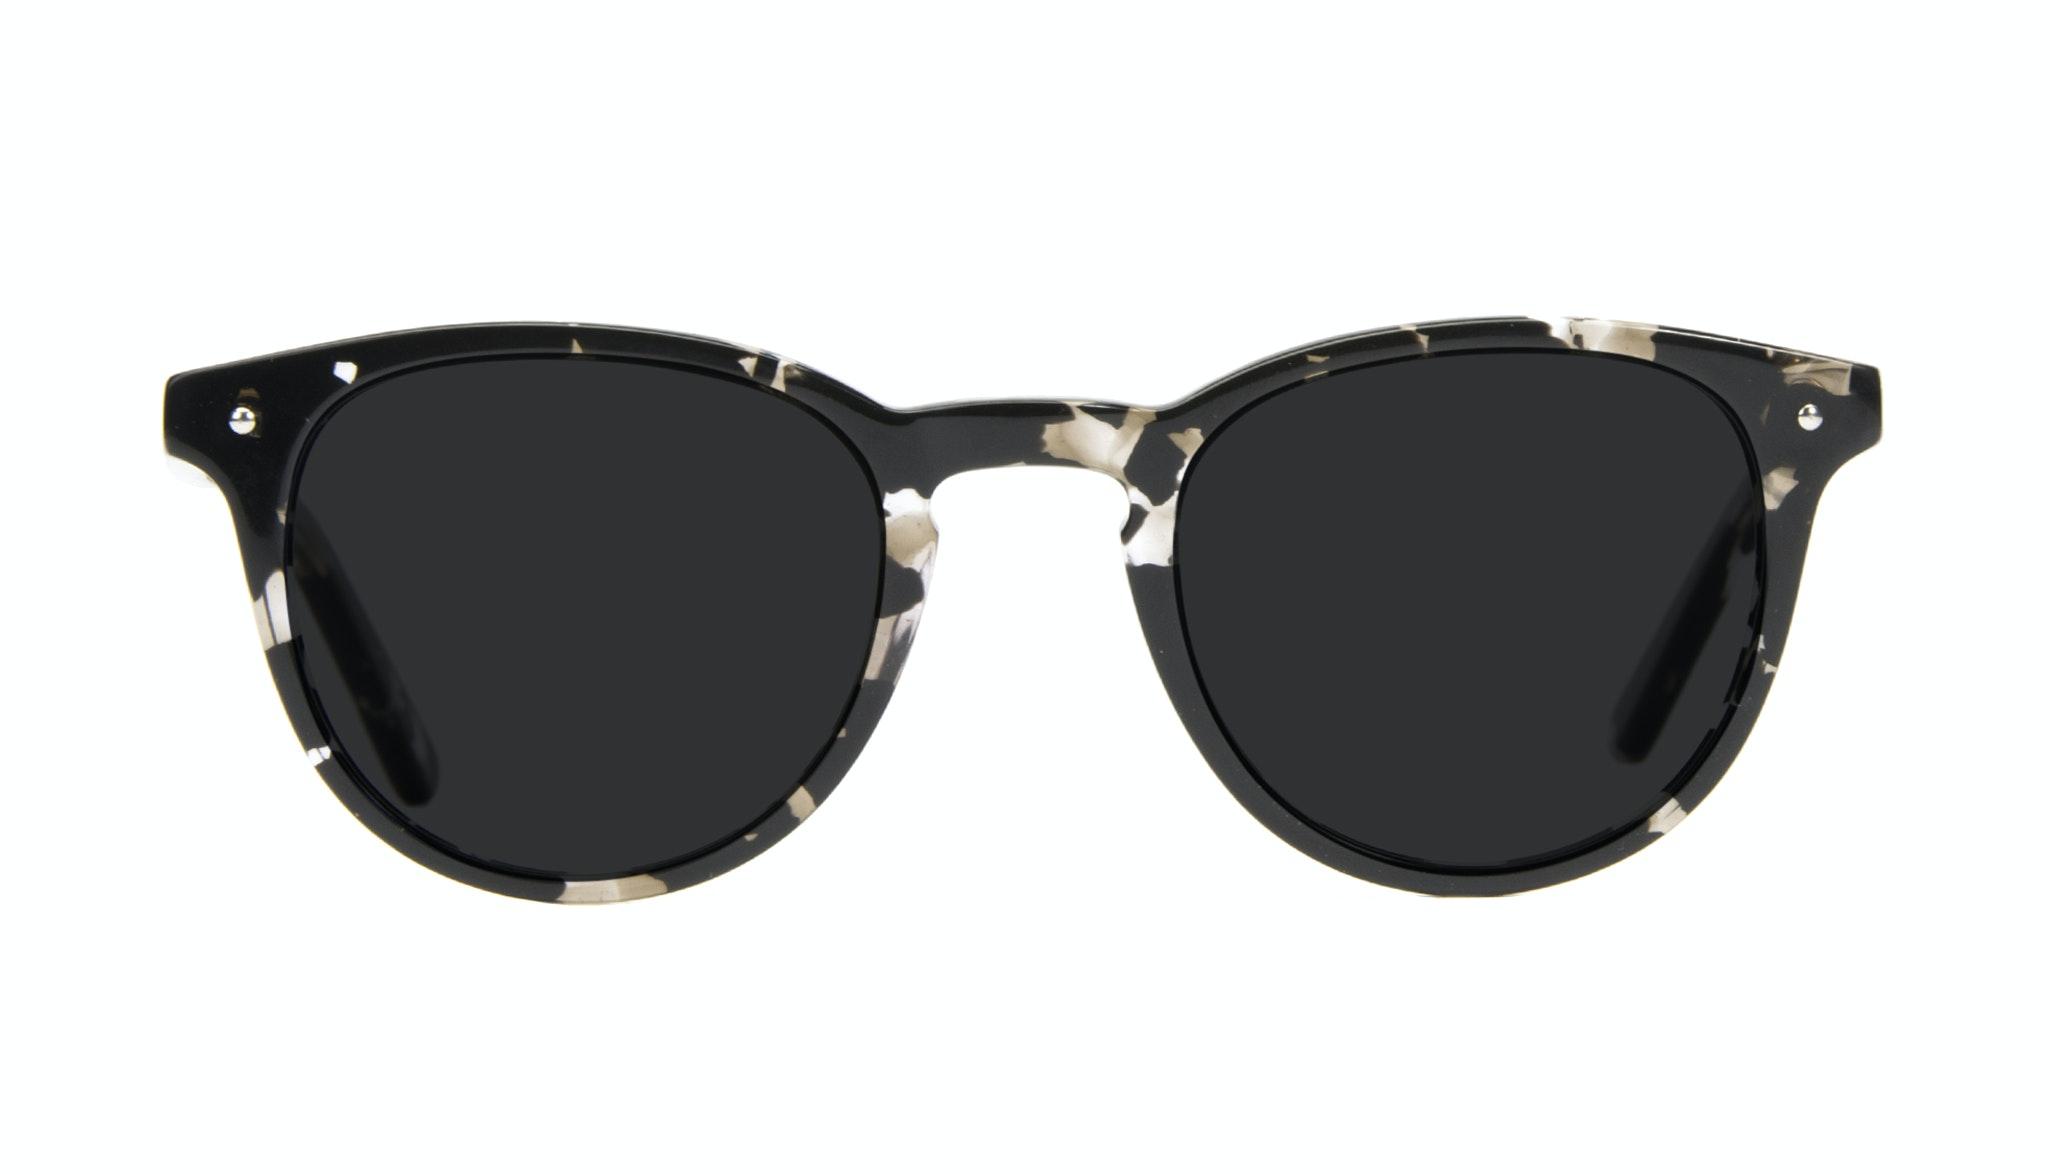 Affordable Fashion Glasses Round Sunglasses Men Cult Stone